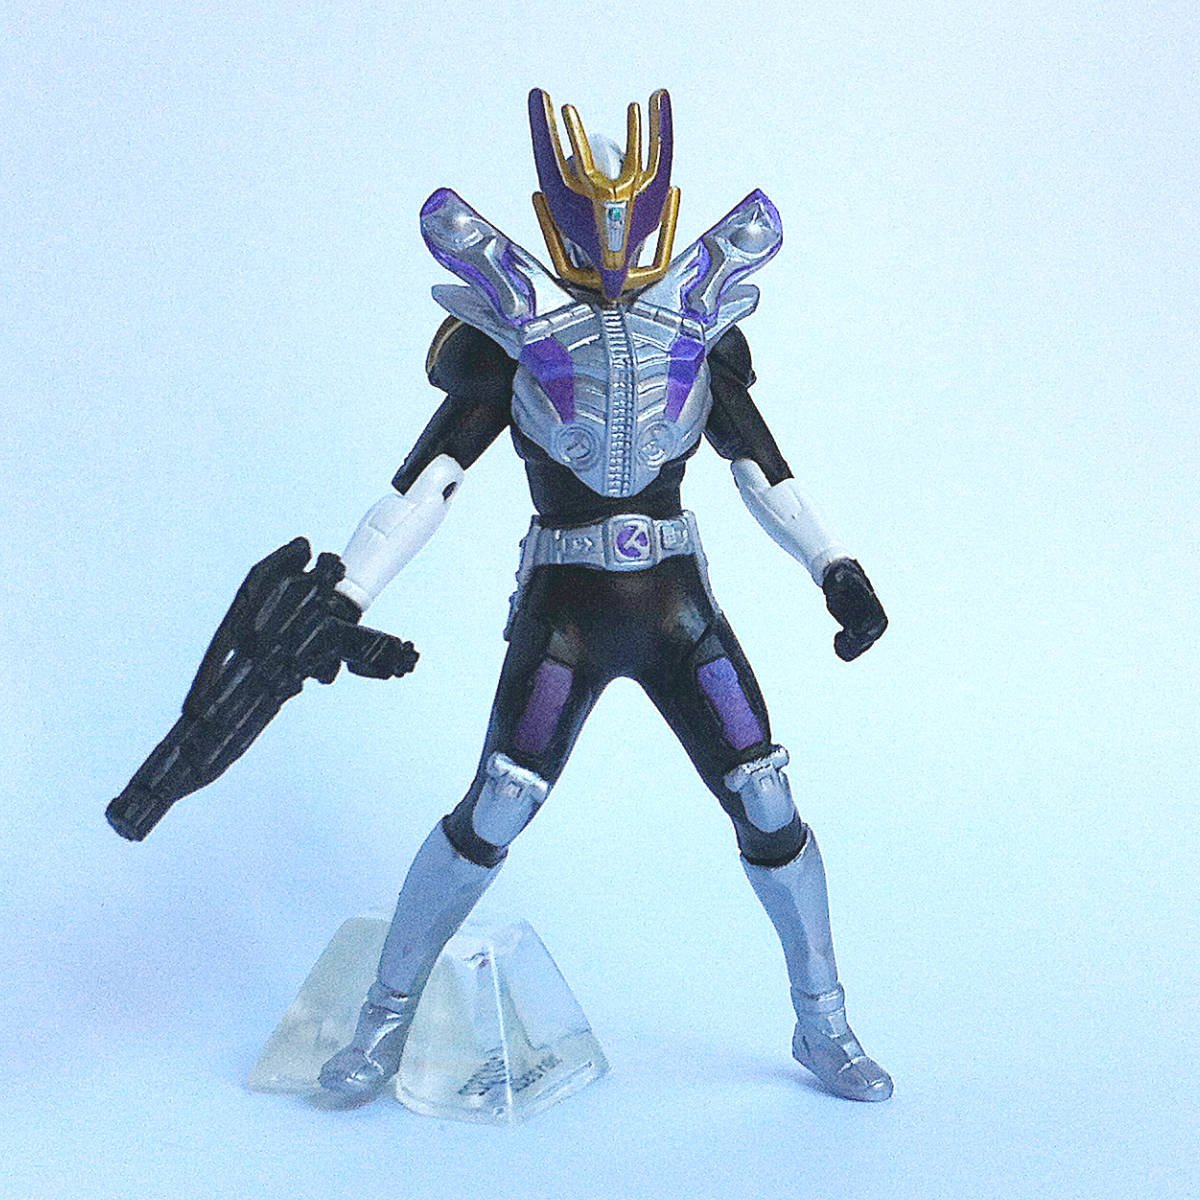 Kamen Rider Den-O Gun Form from Kamen Rider Action Pose by Bandai